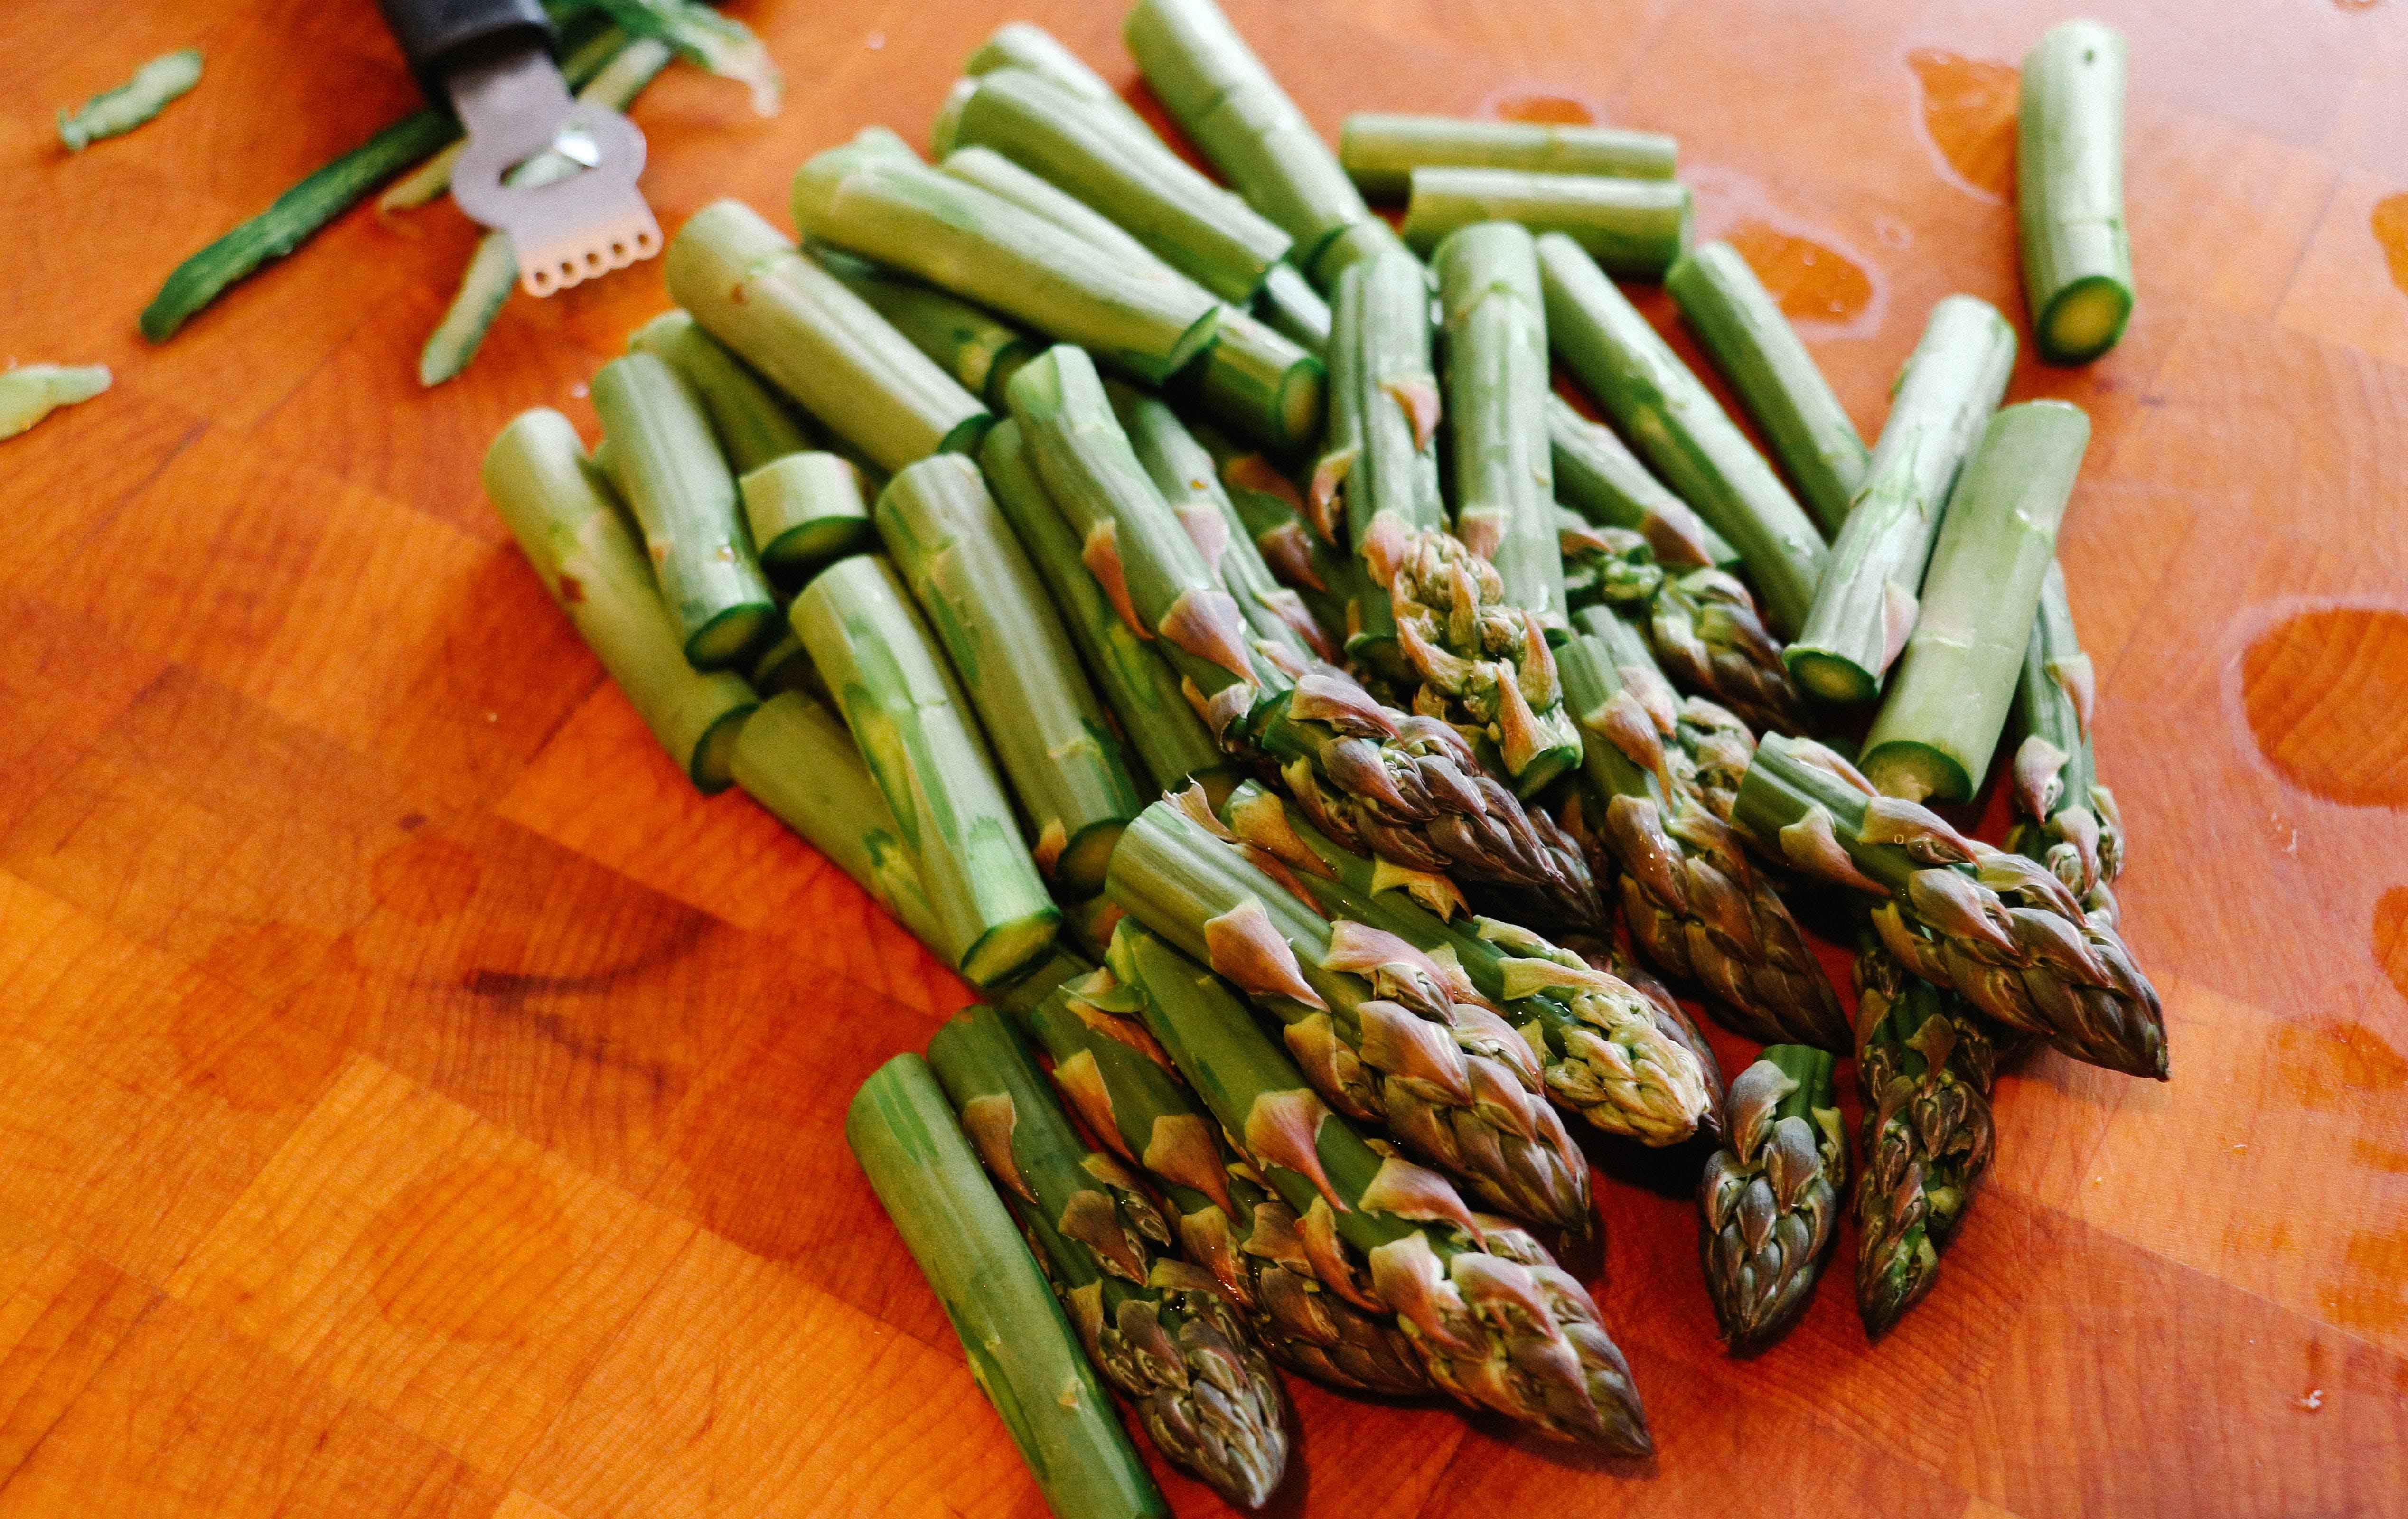 Sliced Green Paragus